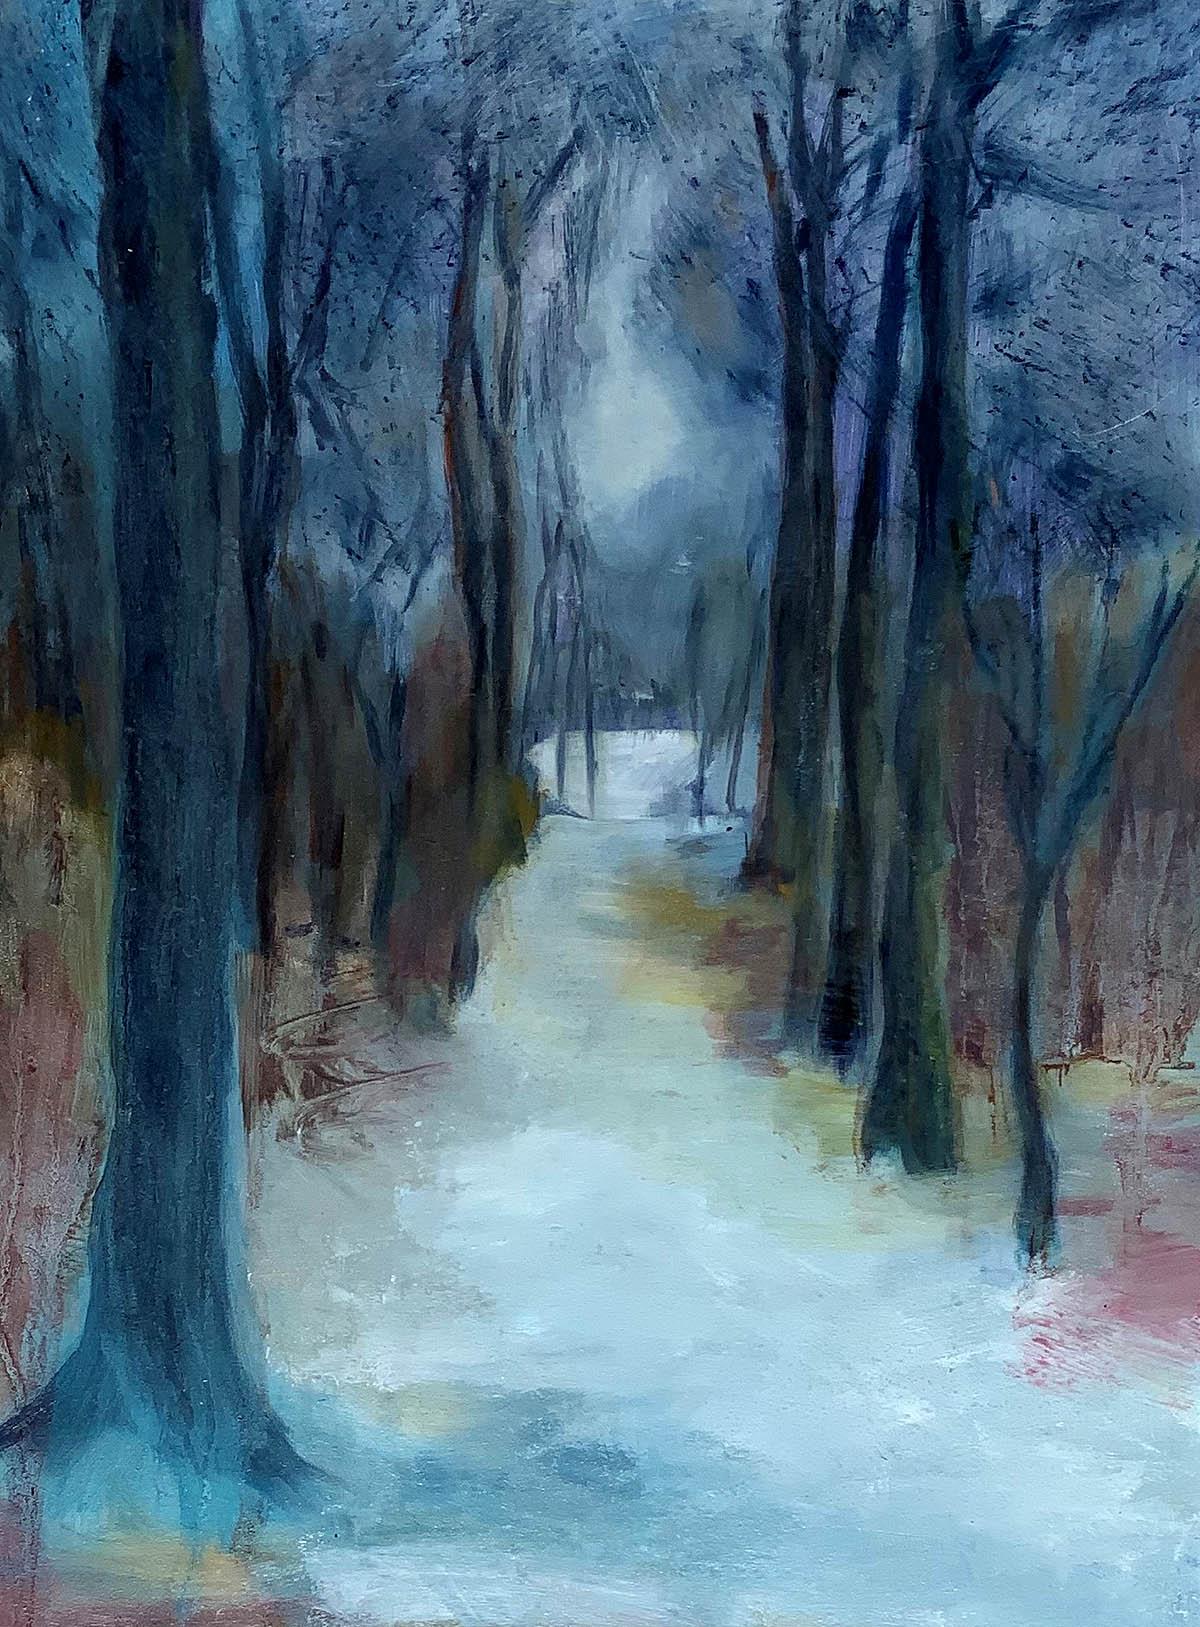 Carolyn Maxwell, 'Winter Trees, Ravelston park', oil on gesso board